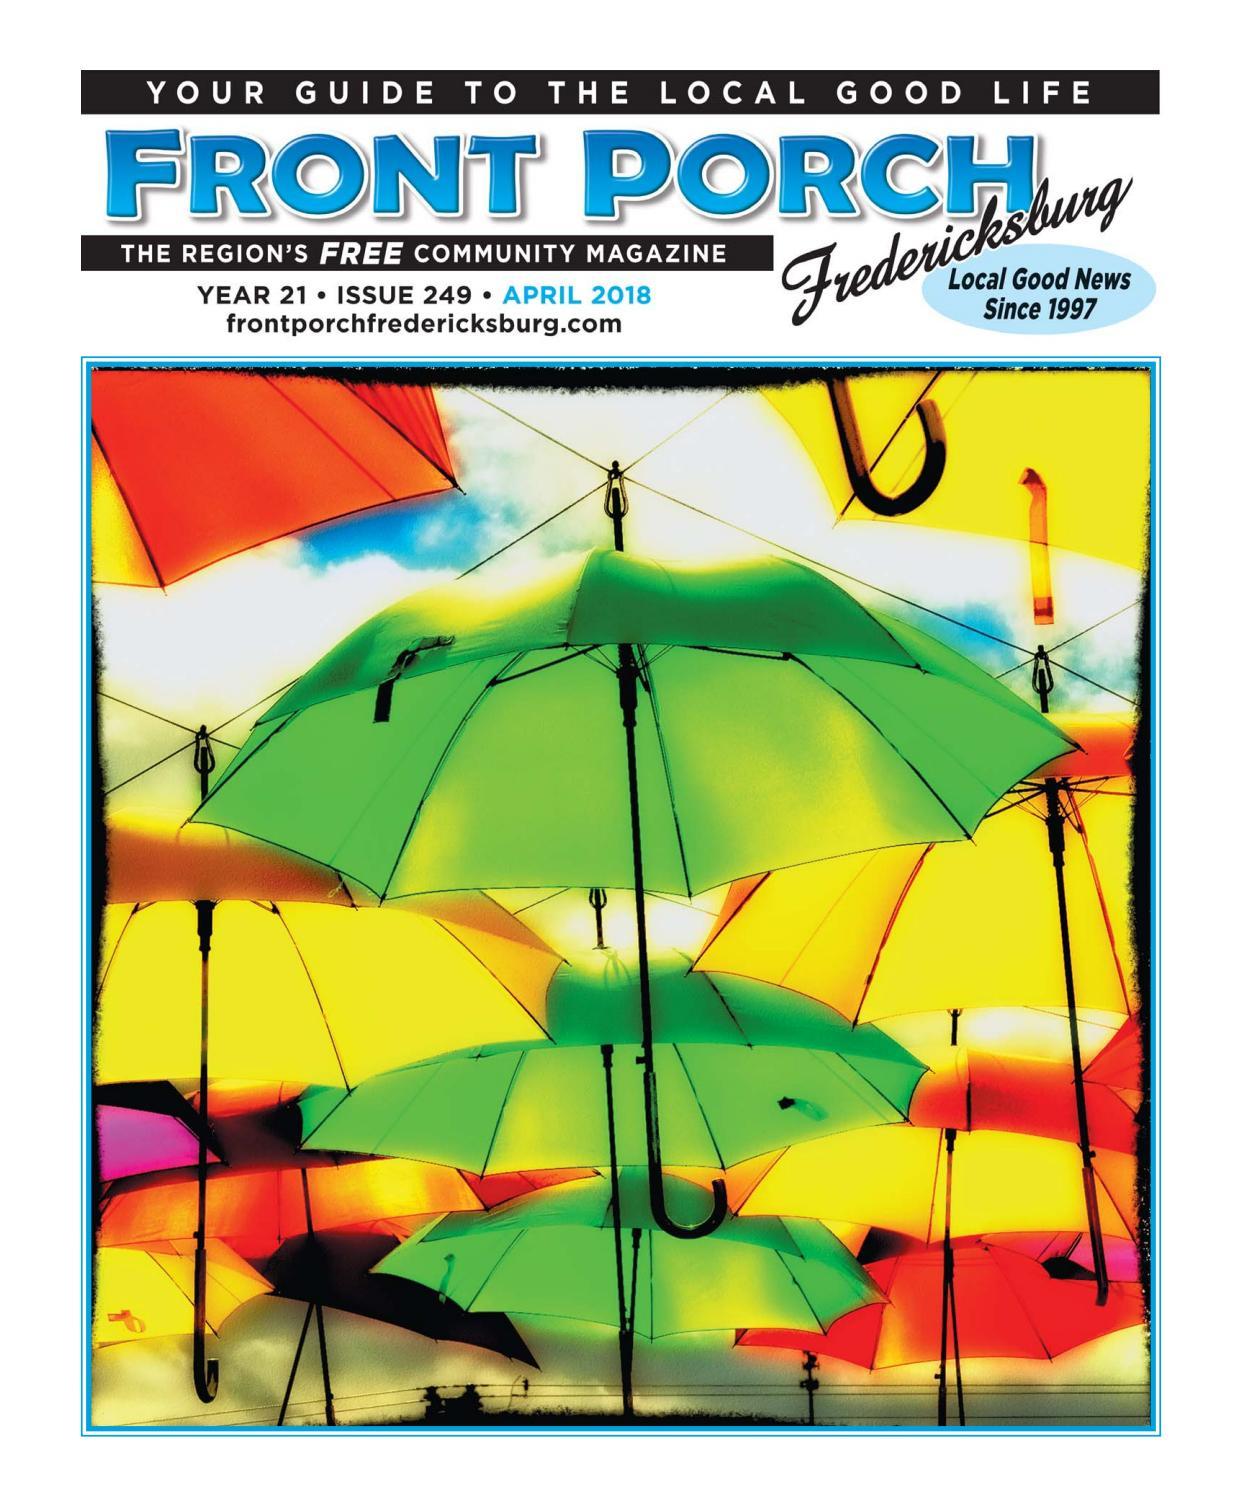 cc64ff89c77c Front Porch Fredericksburg - April 2018 by Virginia Grogan - issuu